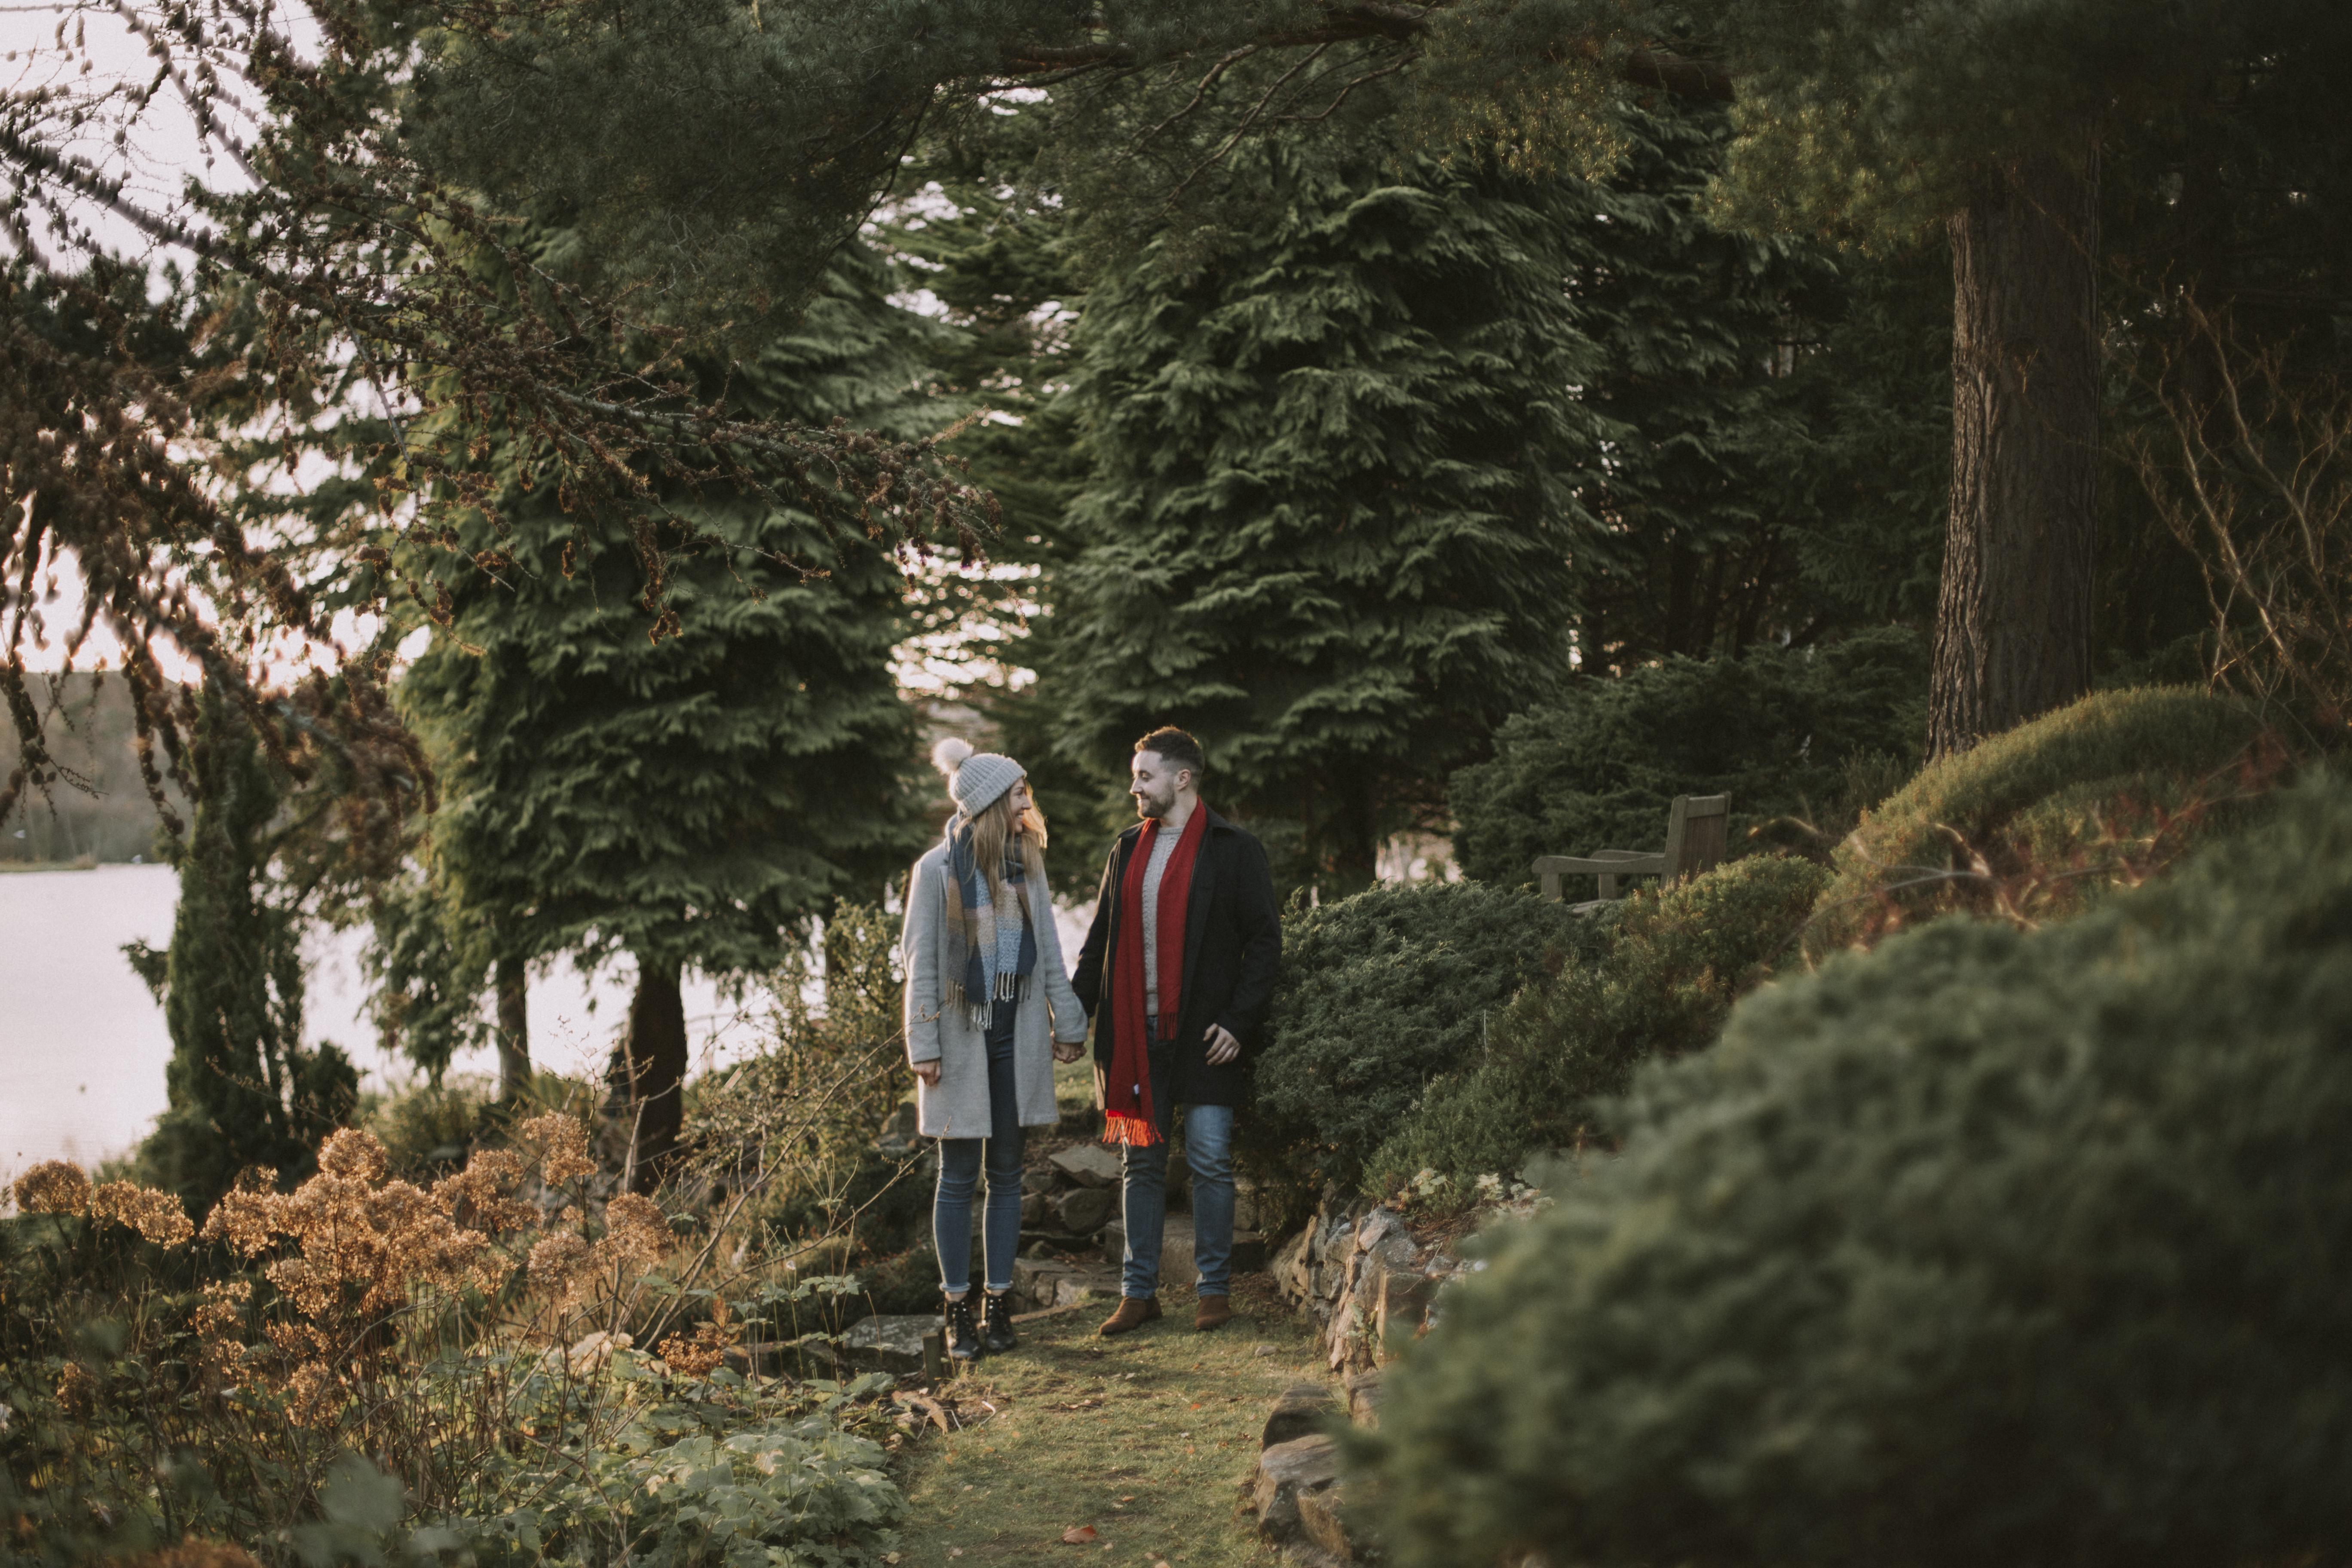 Edinburgh Secret Engagement Proposal in Dr Neils Garden near holyrood park | Scottish Engagement Photographer | Proposal Photography | Ceranna Photo